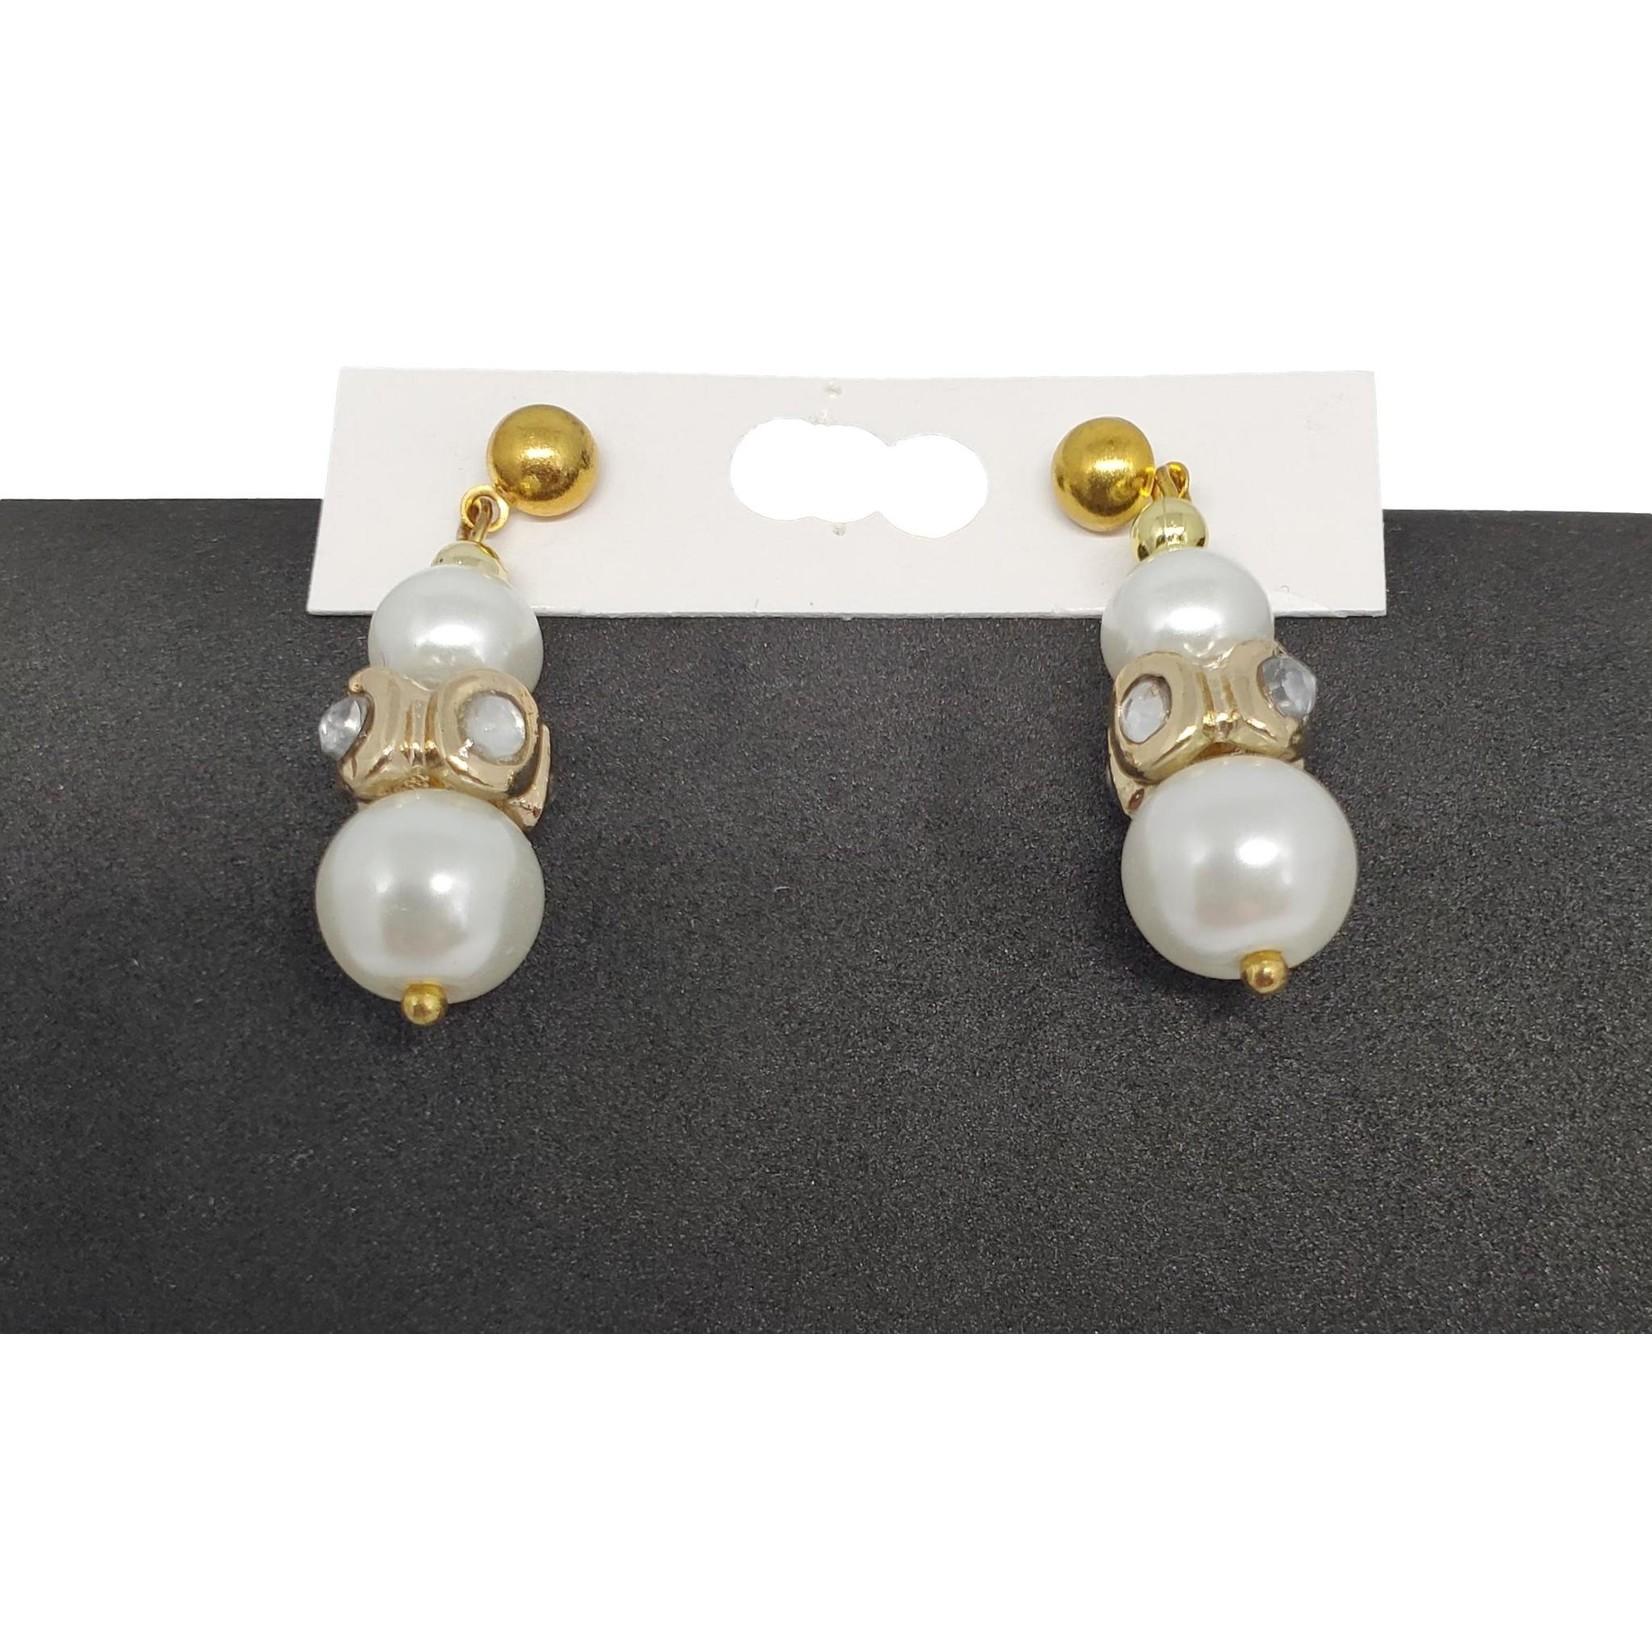 Jewellery by Deborah Young-Groves Double Pearl Drop Earrings